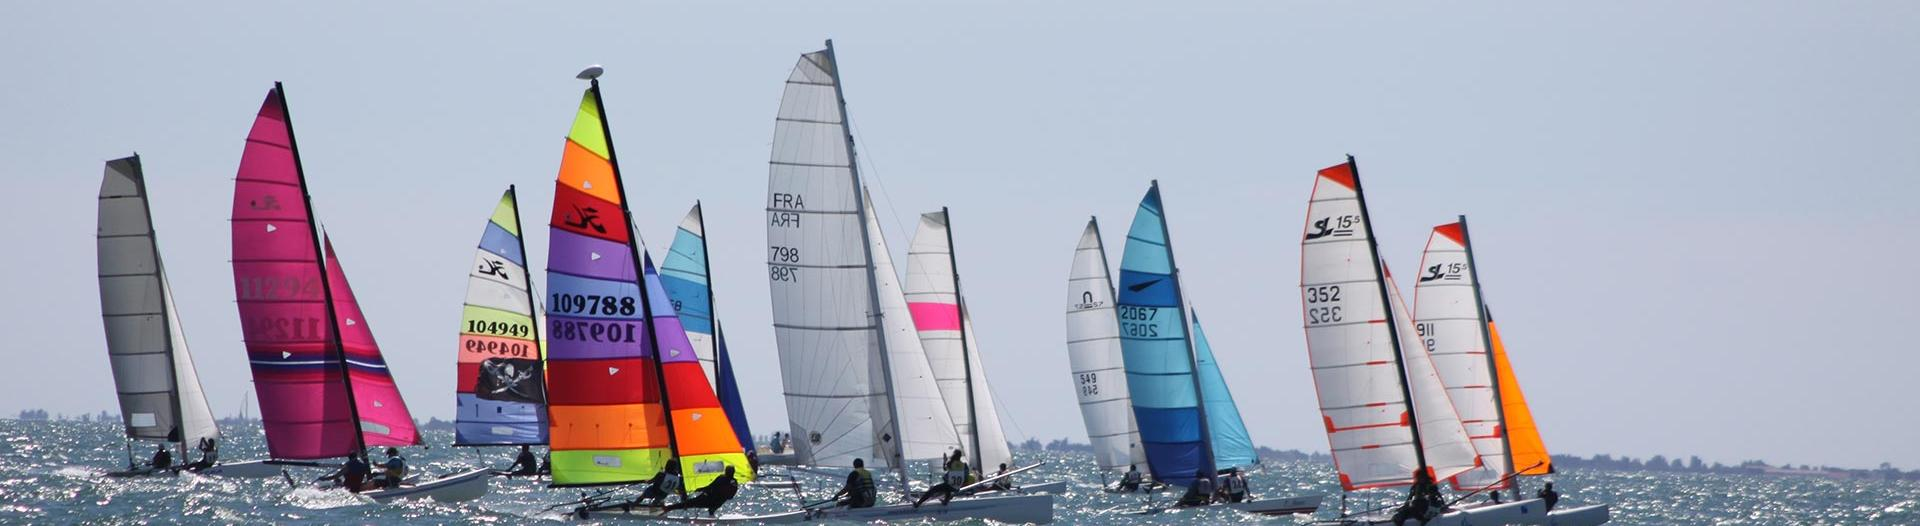 slider-vendee-regate-bateaux